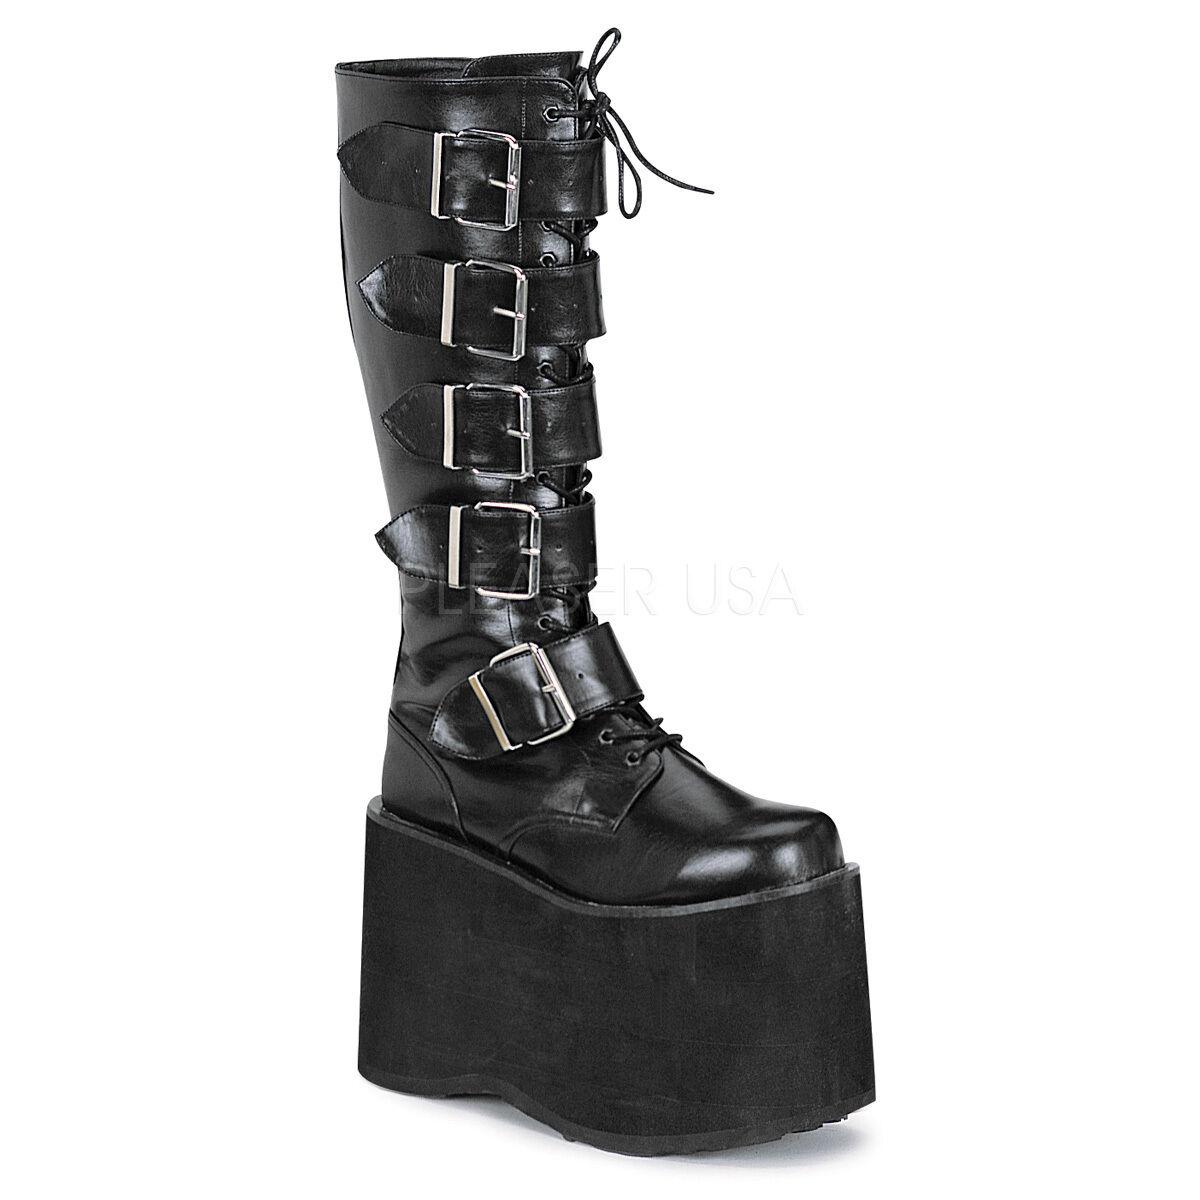 DEMONIA Men's Gothic Punk Cyber High Platform Military Buckle Up Knee Boots